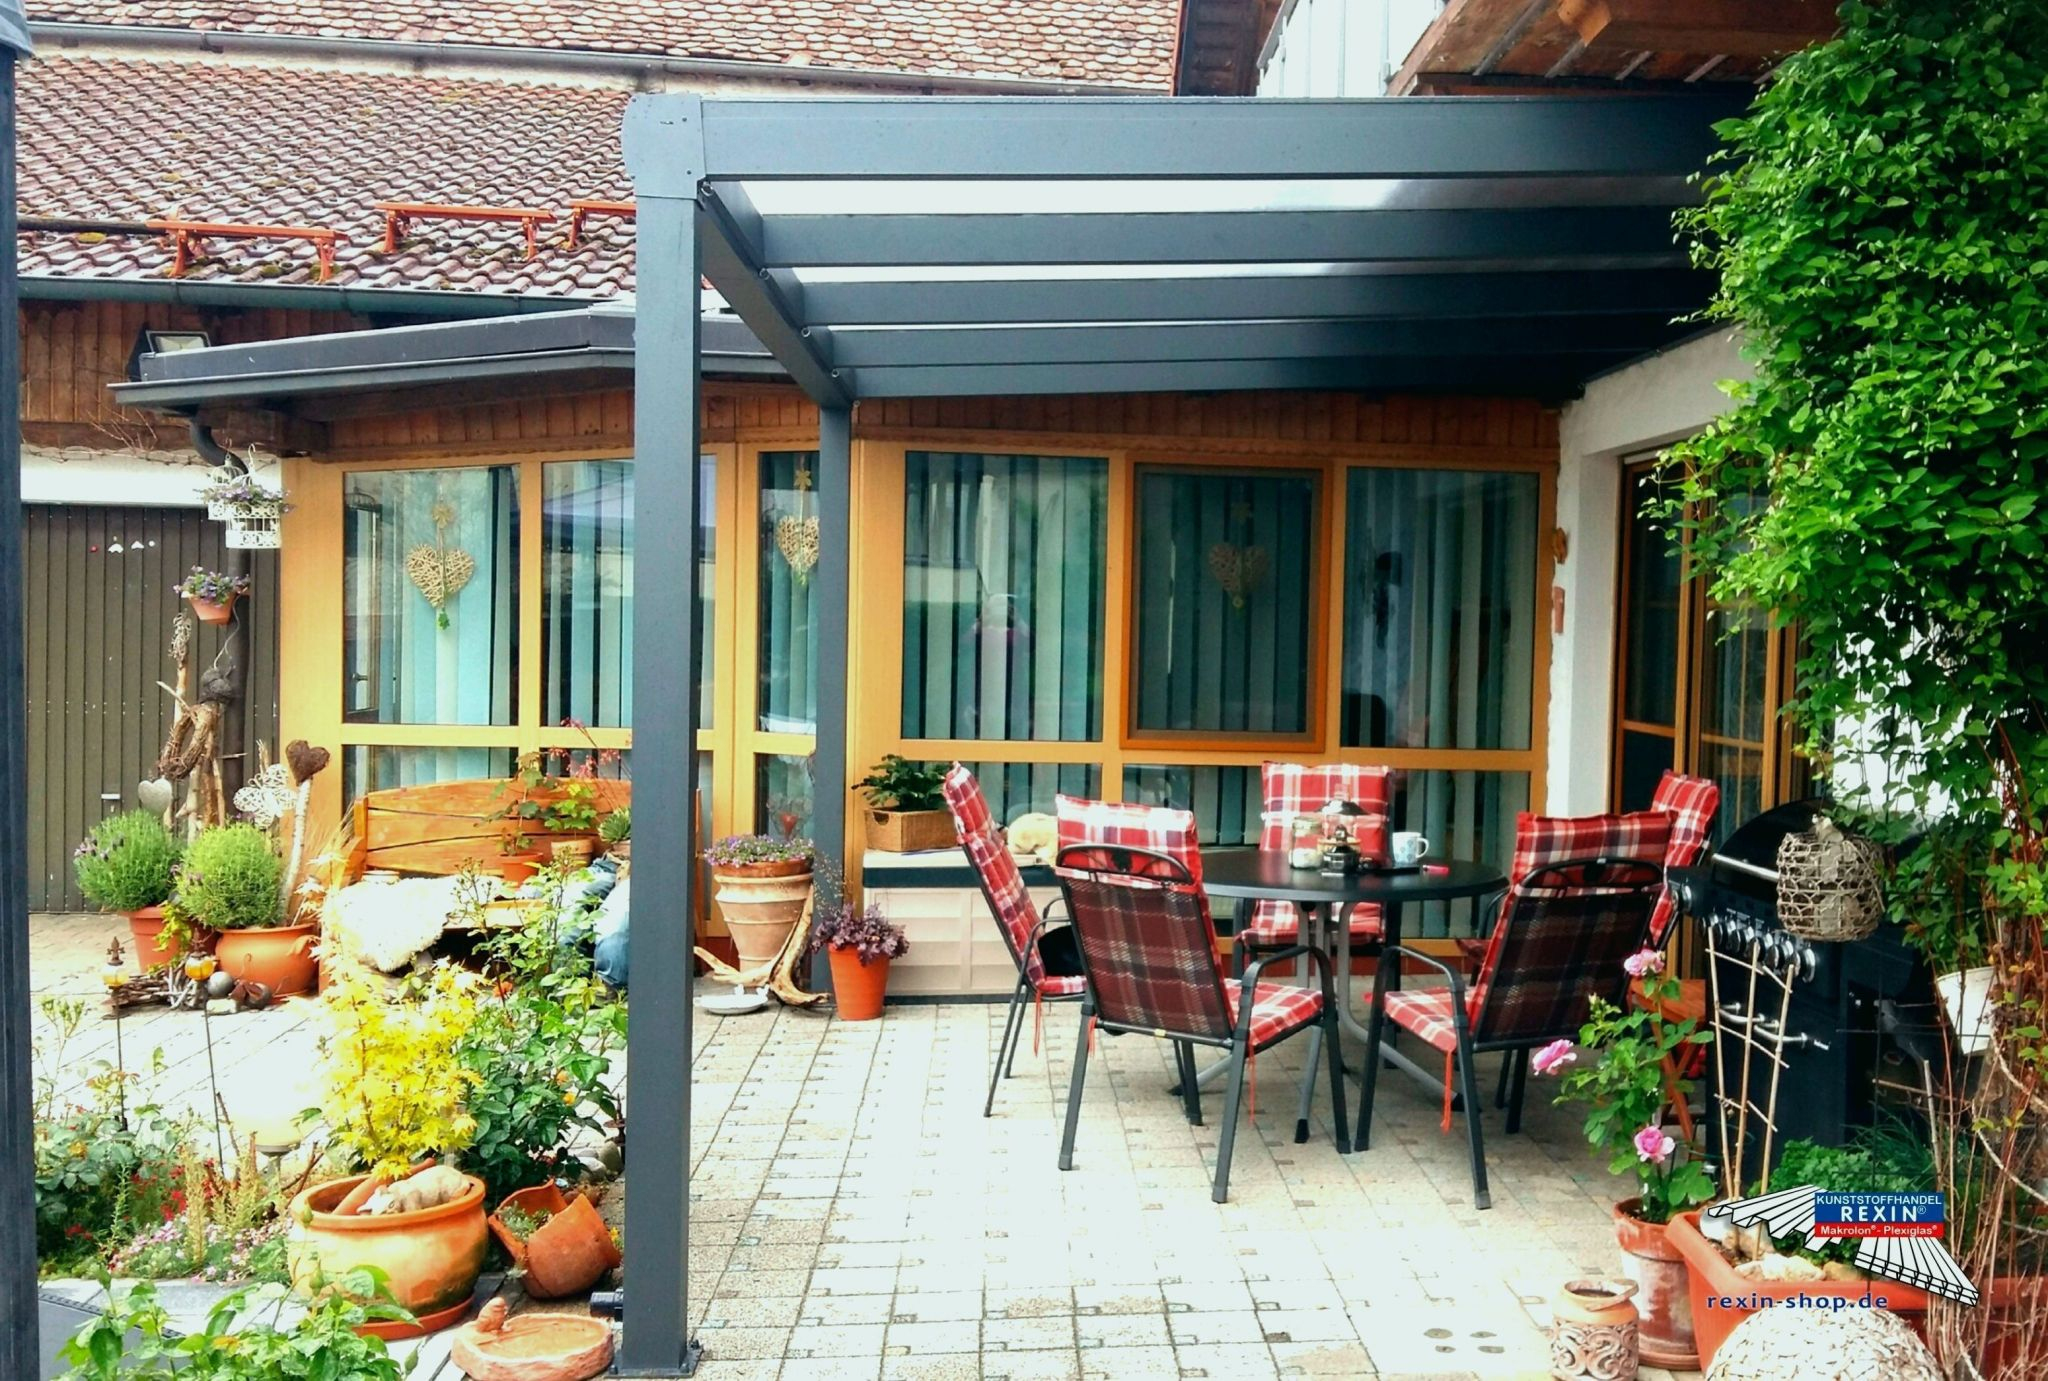 26 Charmant Amenagement Salon De Jardin | Salon Jardin serapportantà Amenager Jardin Rectangulaire